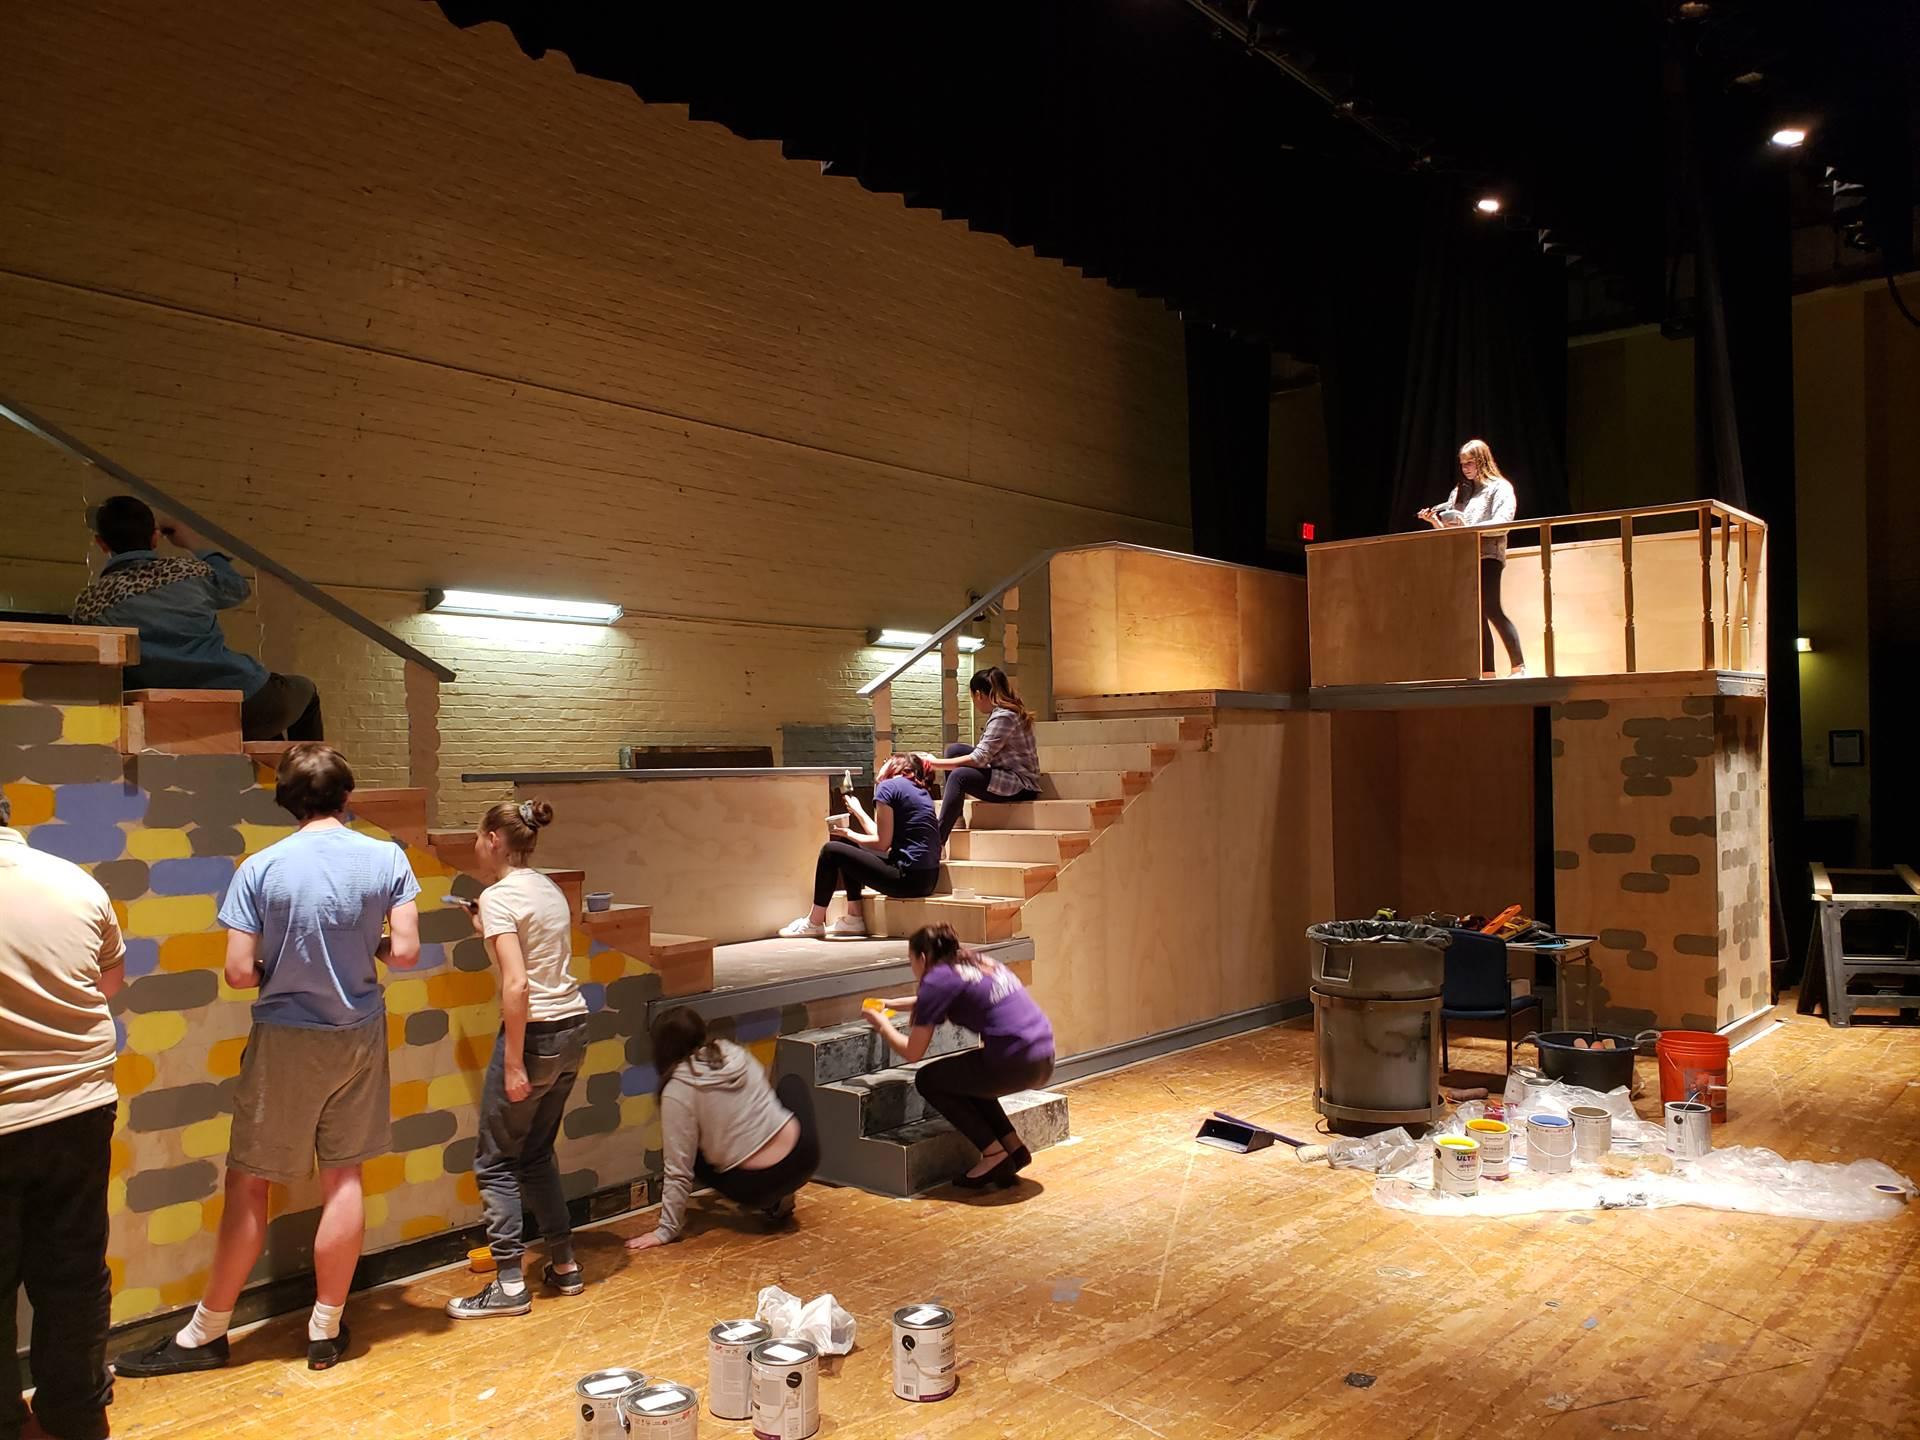 Theatre Arts & Visual Arts Students Collaborating on Set Painting